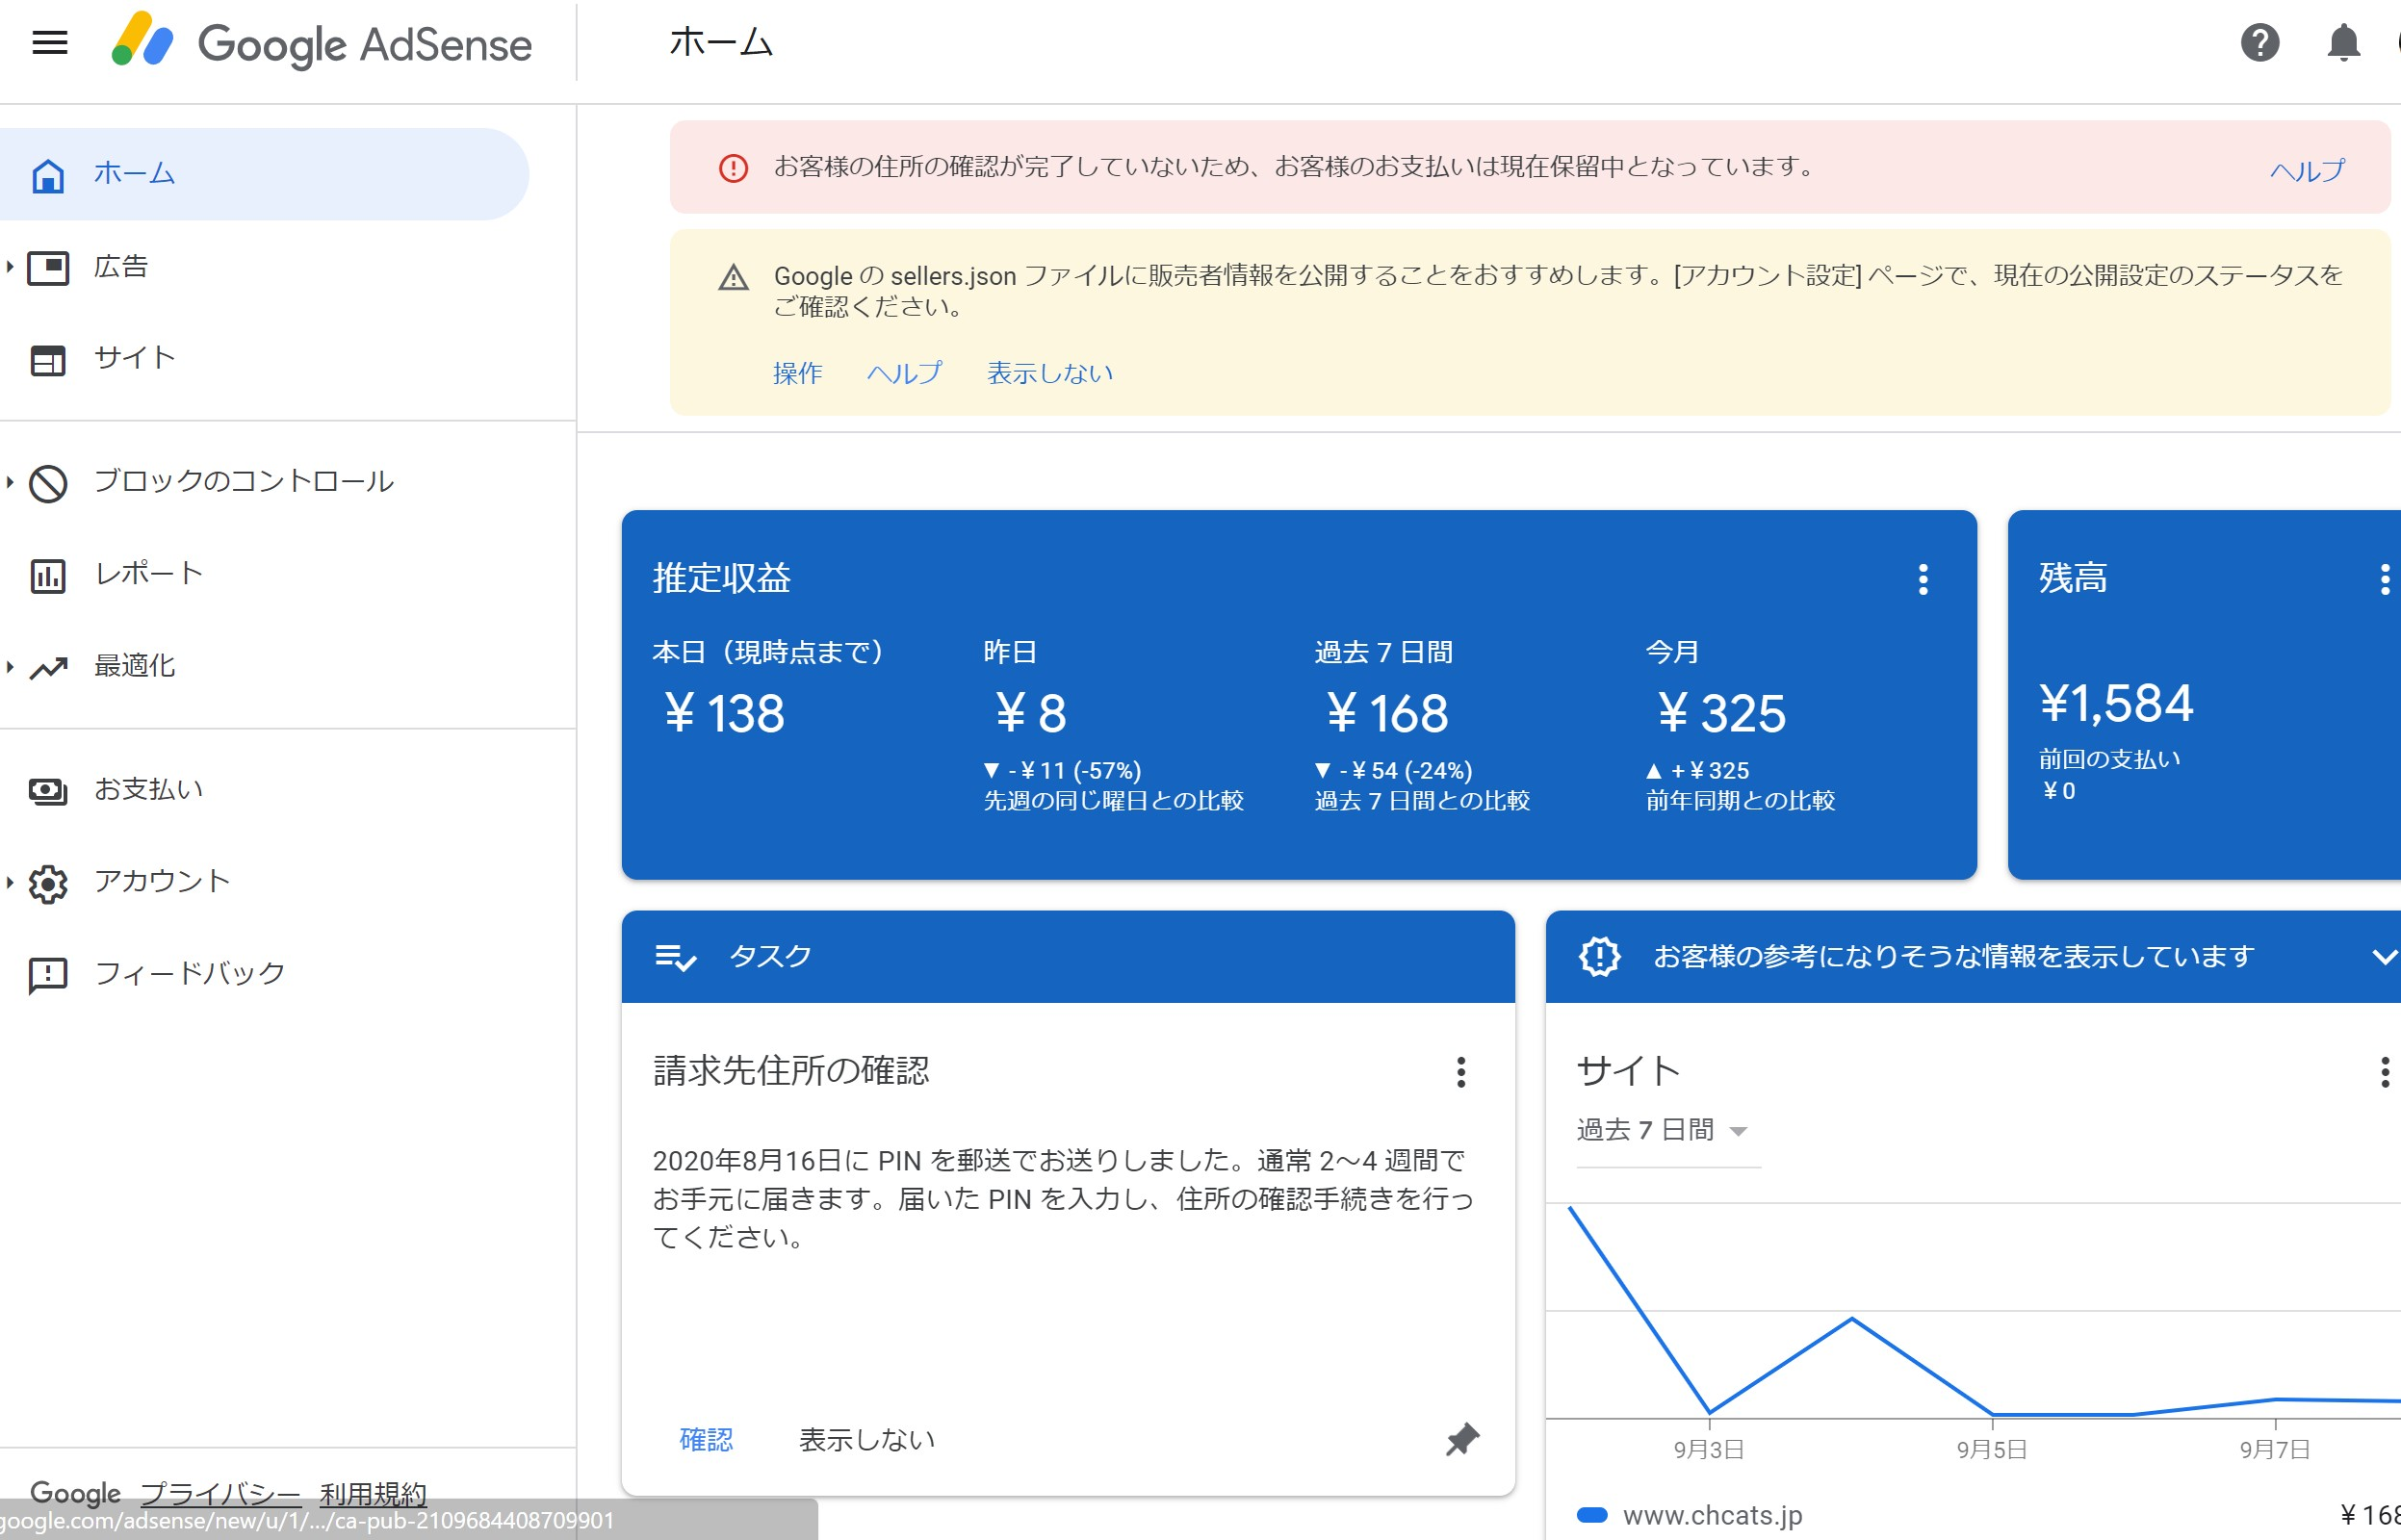 Google AdSense 画面